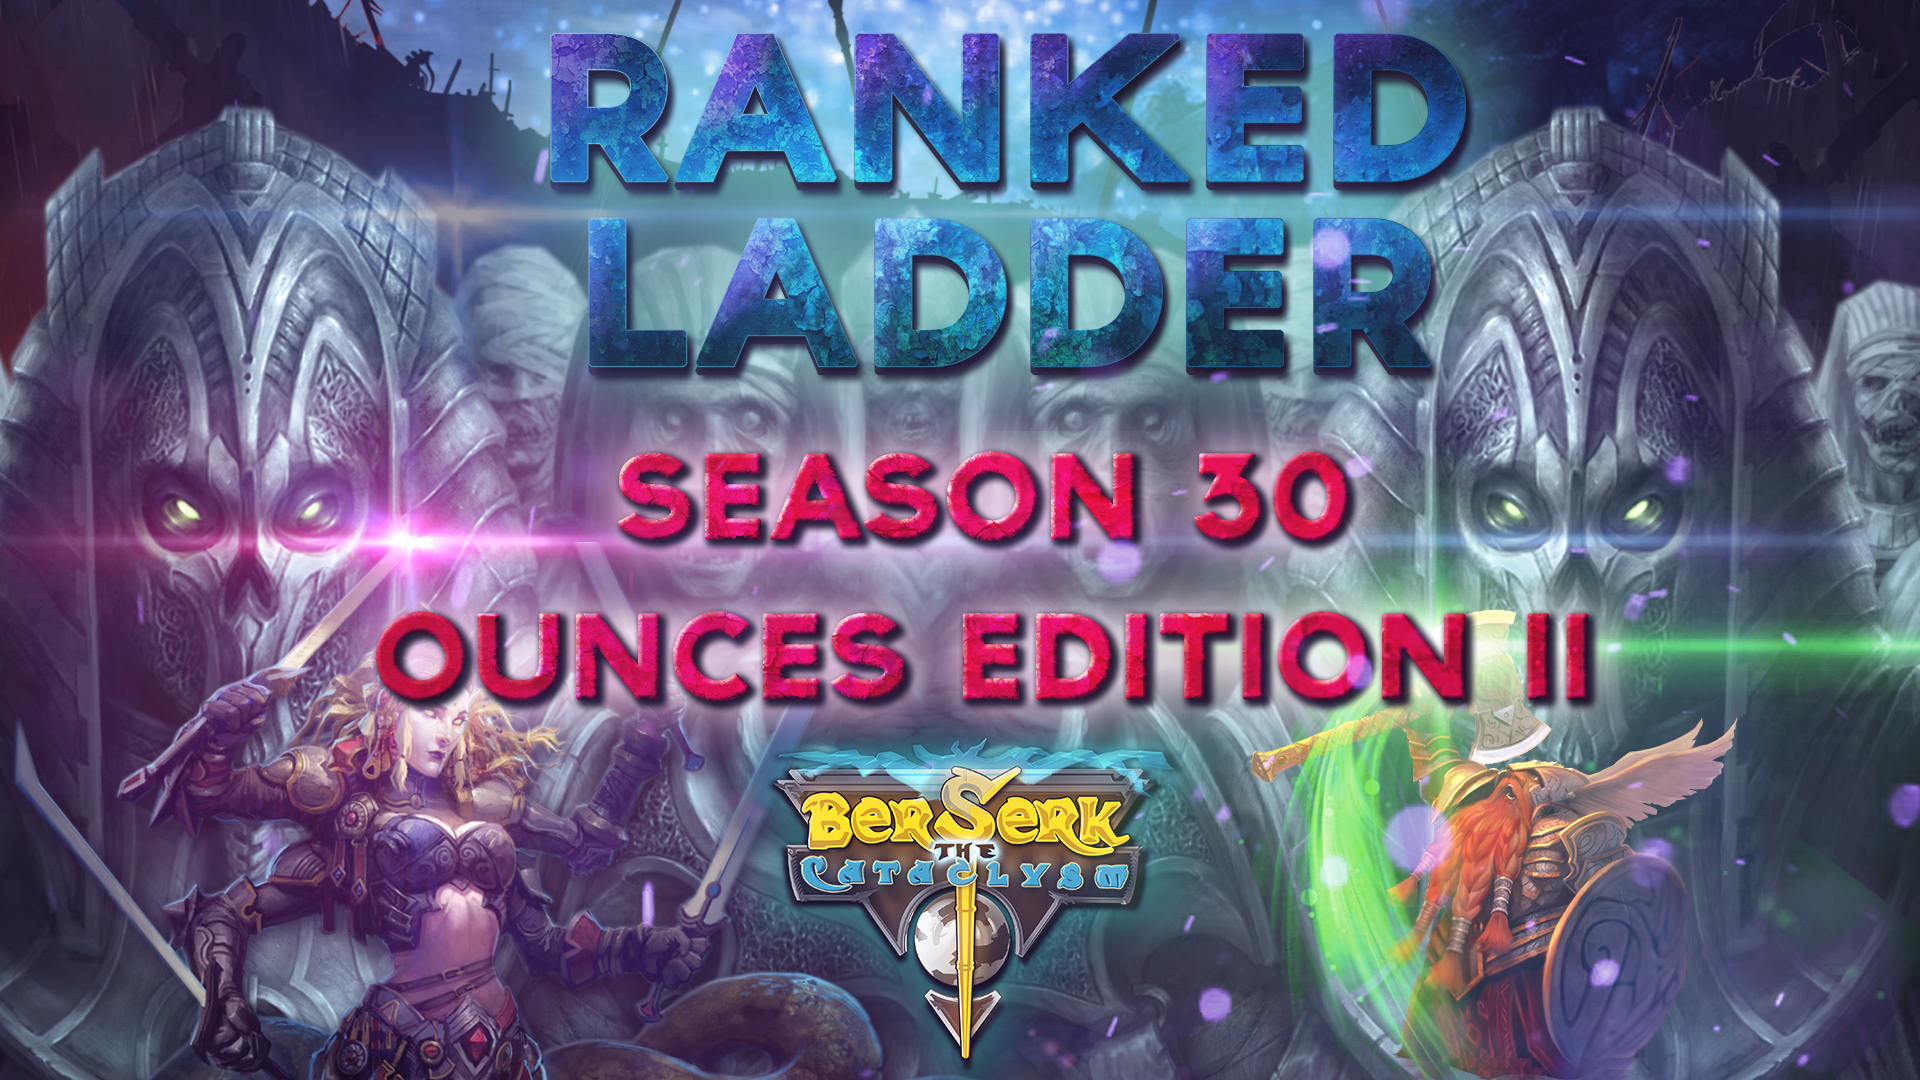 Ranked_LAdder_Season_30.jpg